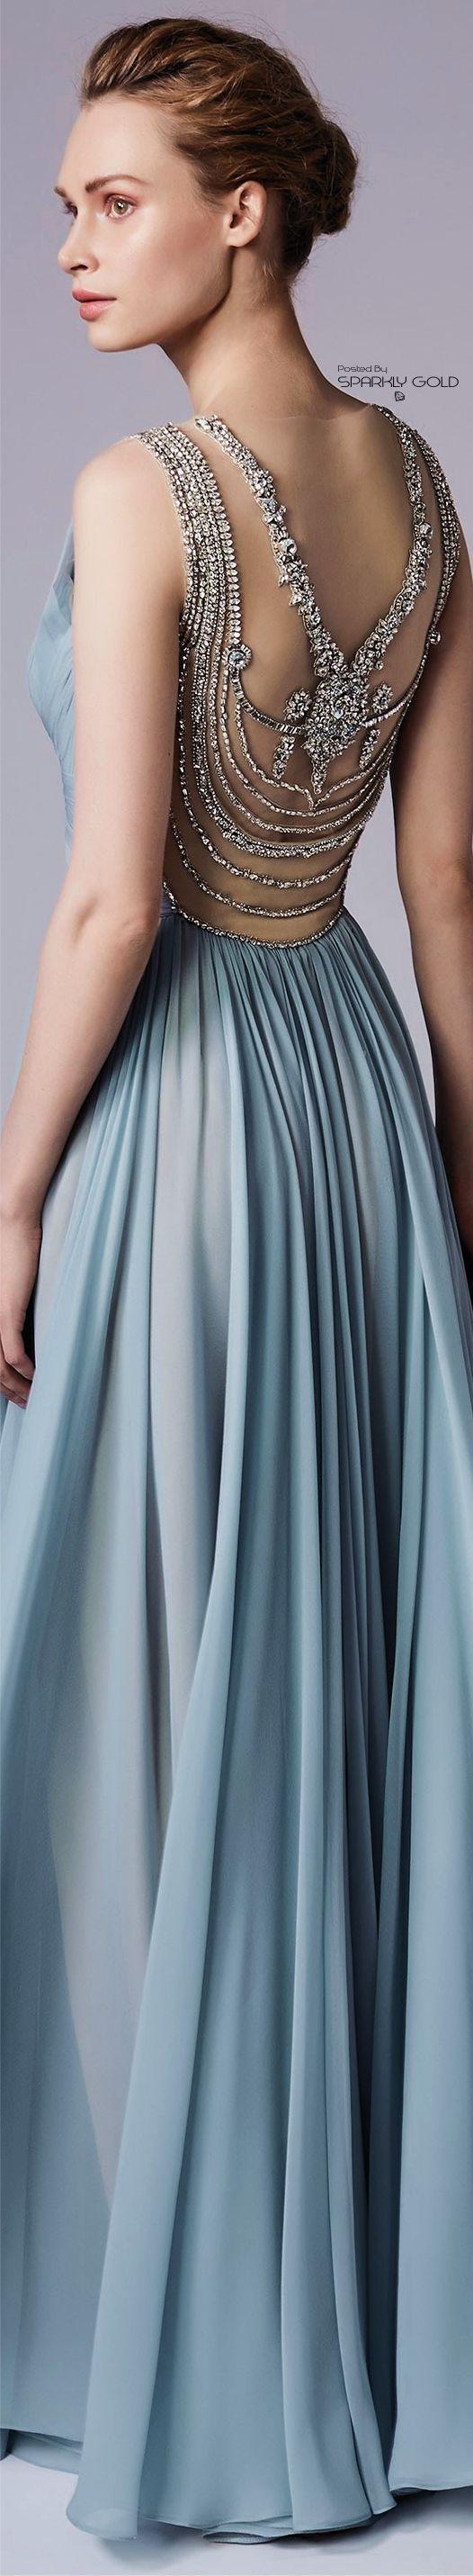 548 best Kleider images on Pinterest | Formal prom dresses, Night ...